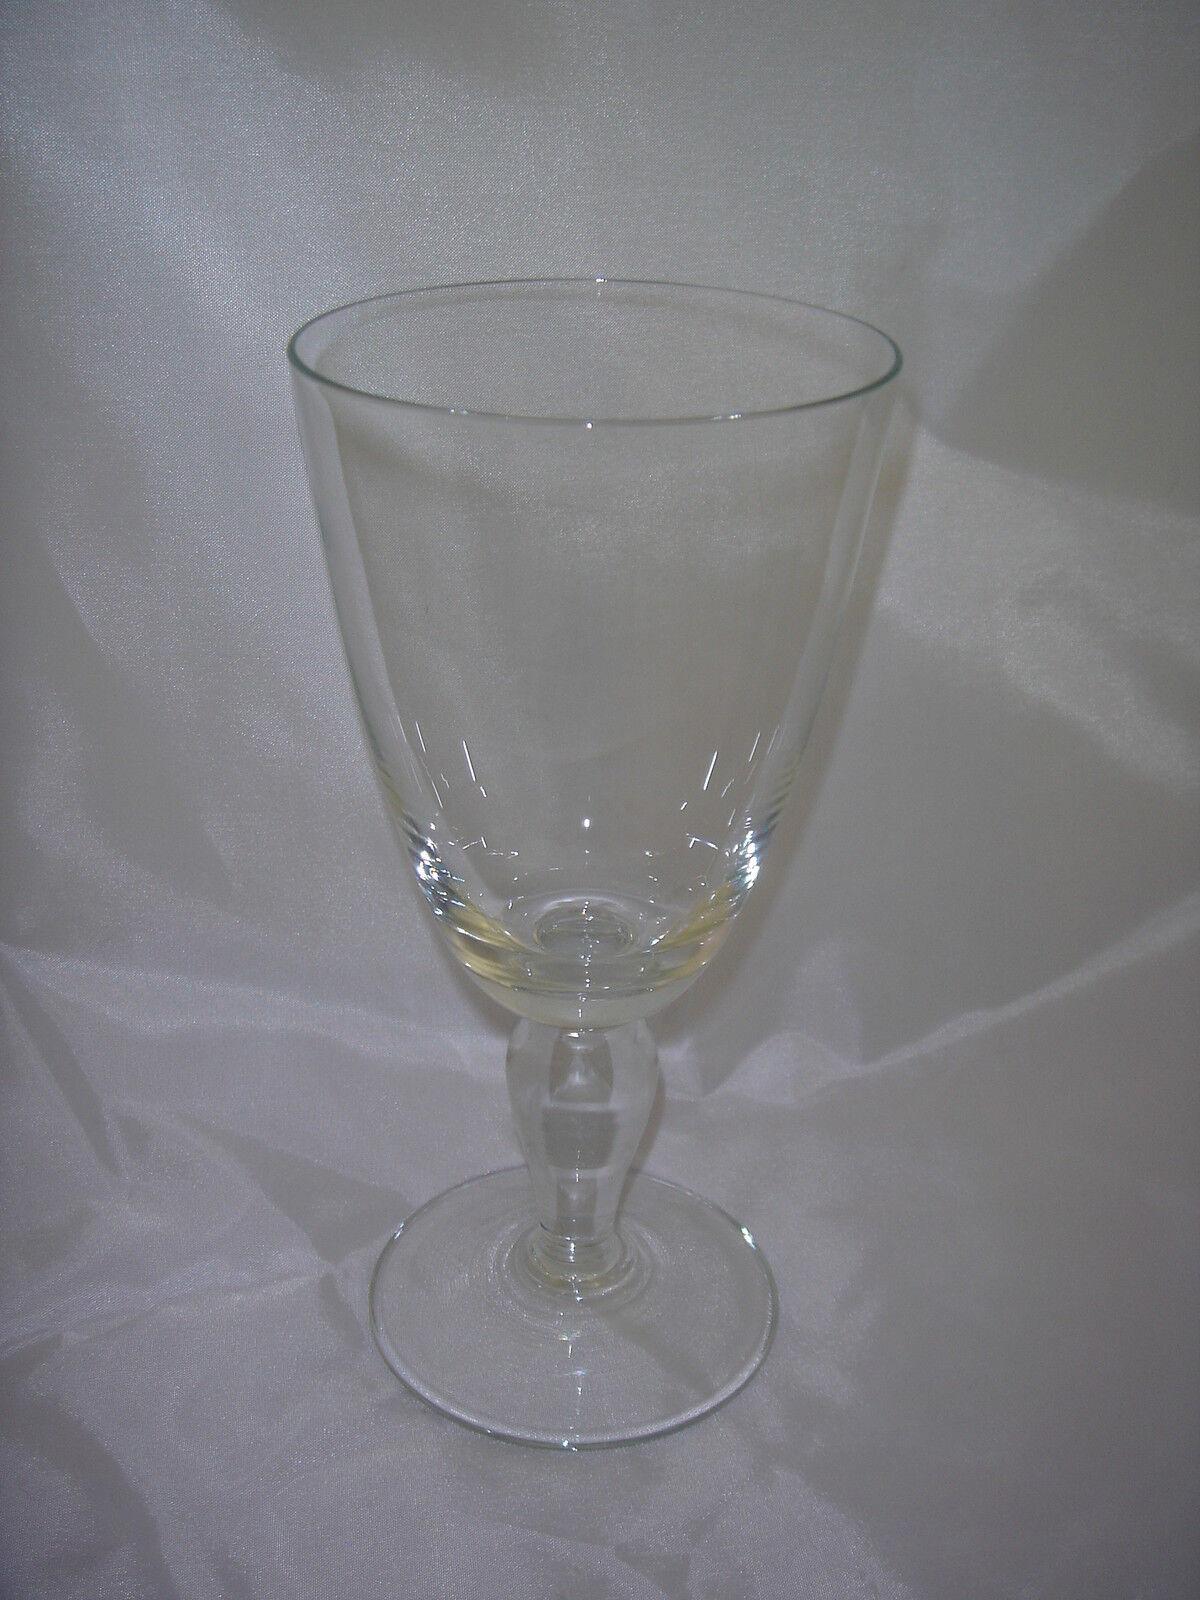 Villeroy & Boch V &B Chalet 6 Weingläser Weinglas Weißweingläser H 16,5 dm  8 cm   Lebhaft und liebenswert